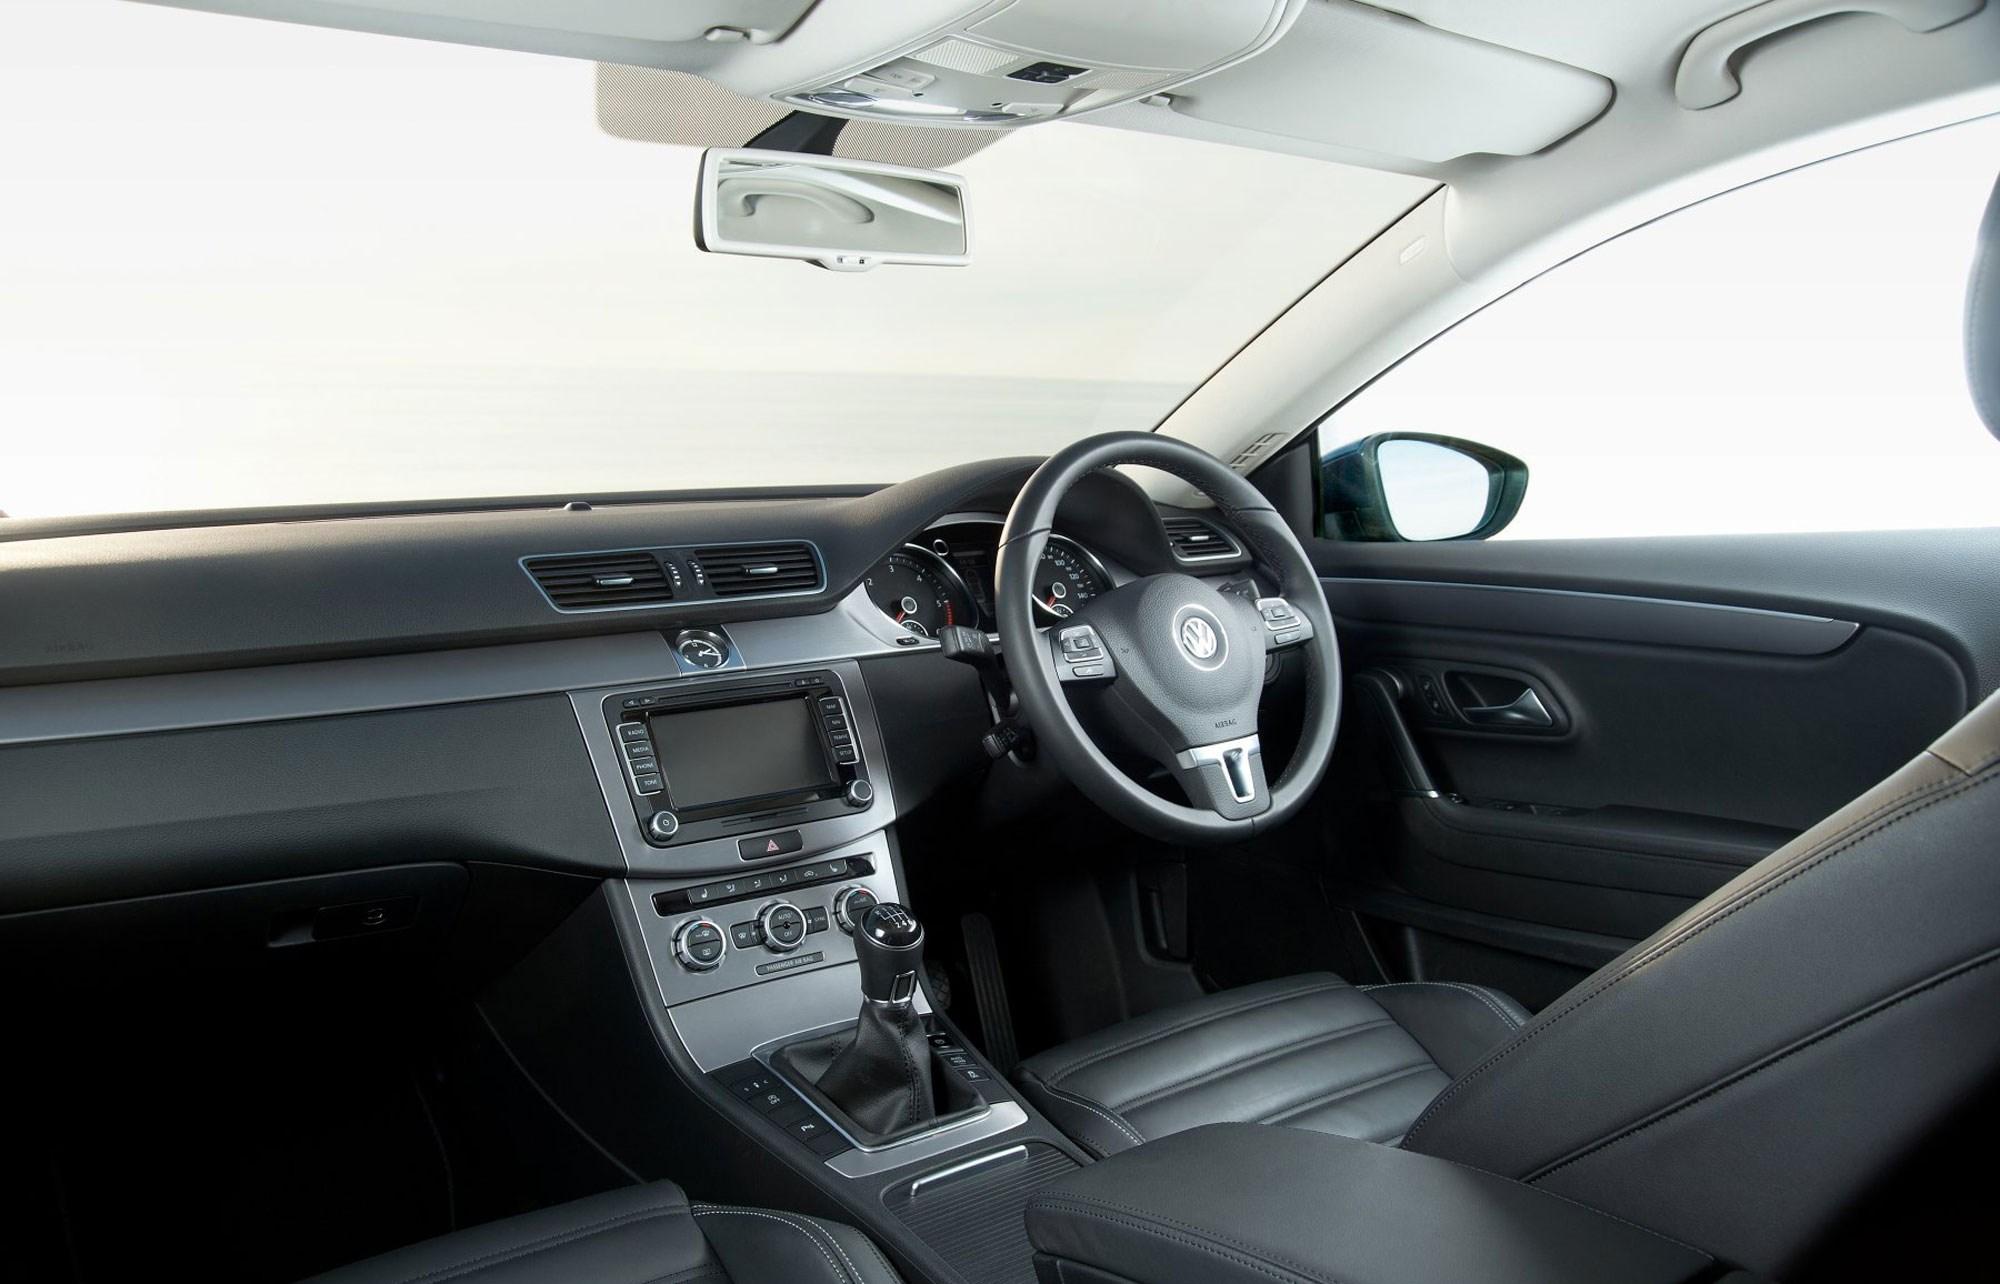 VW CC 2 0 TDI 177 DSG (2015) review | CAR Magazine